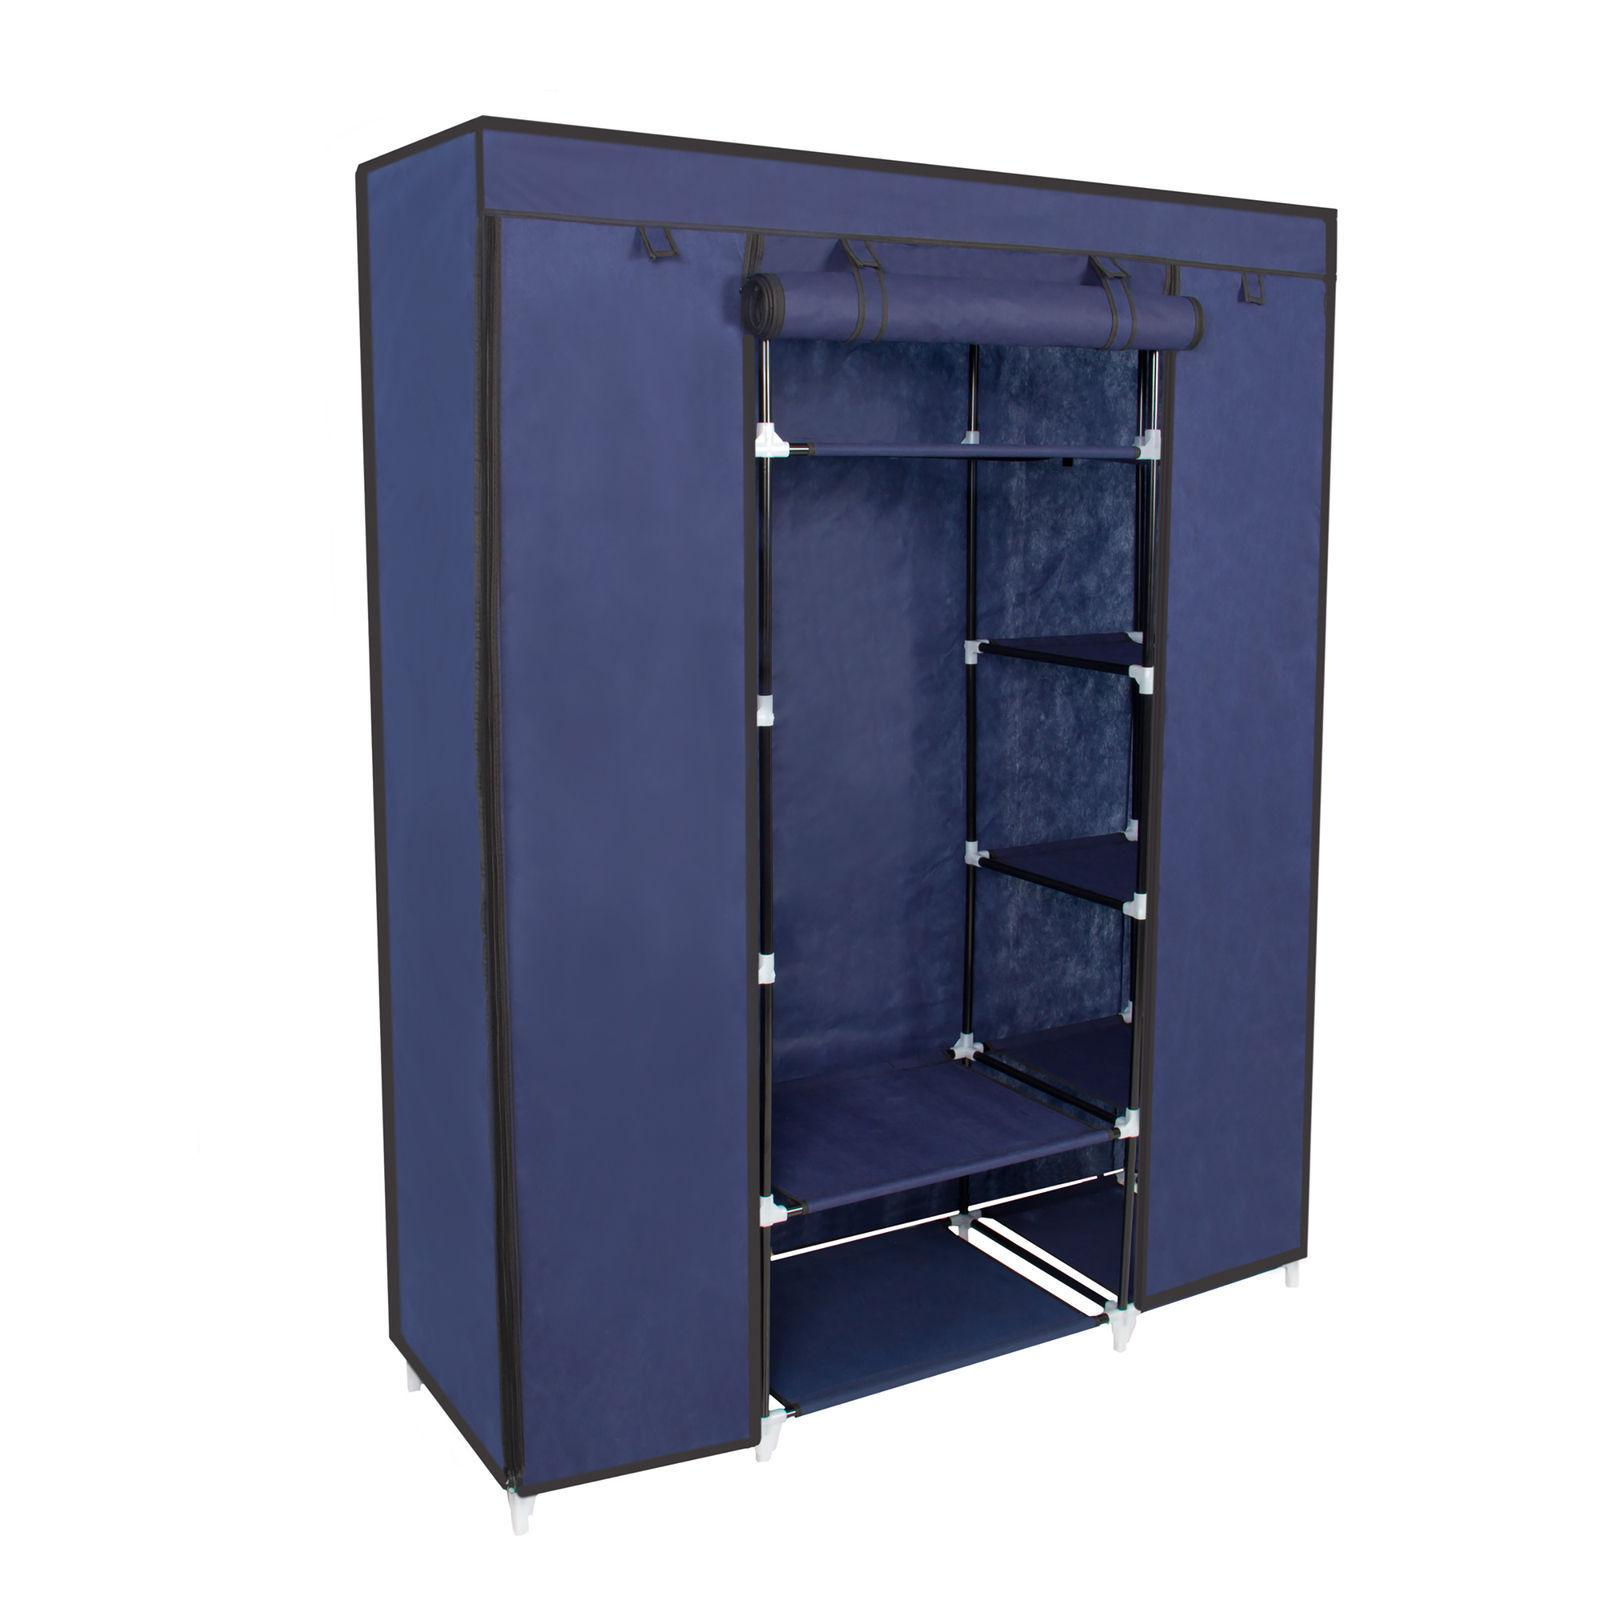 53 Portable Closet Storage Organizer Wardrobe Clothes Rack W